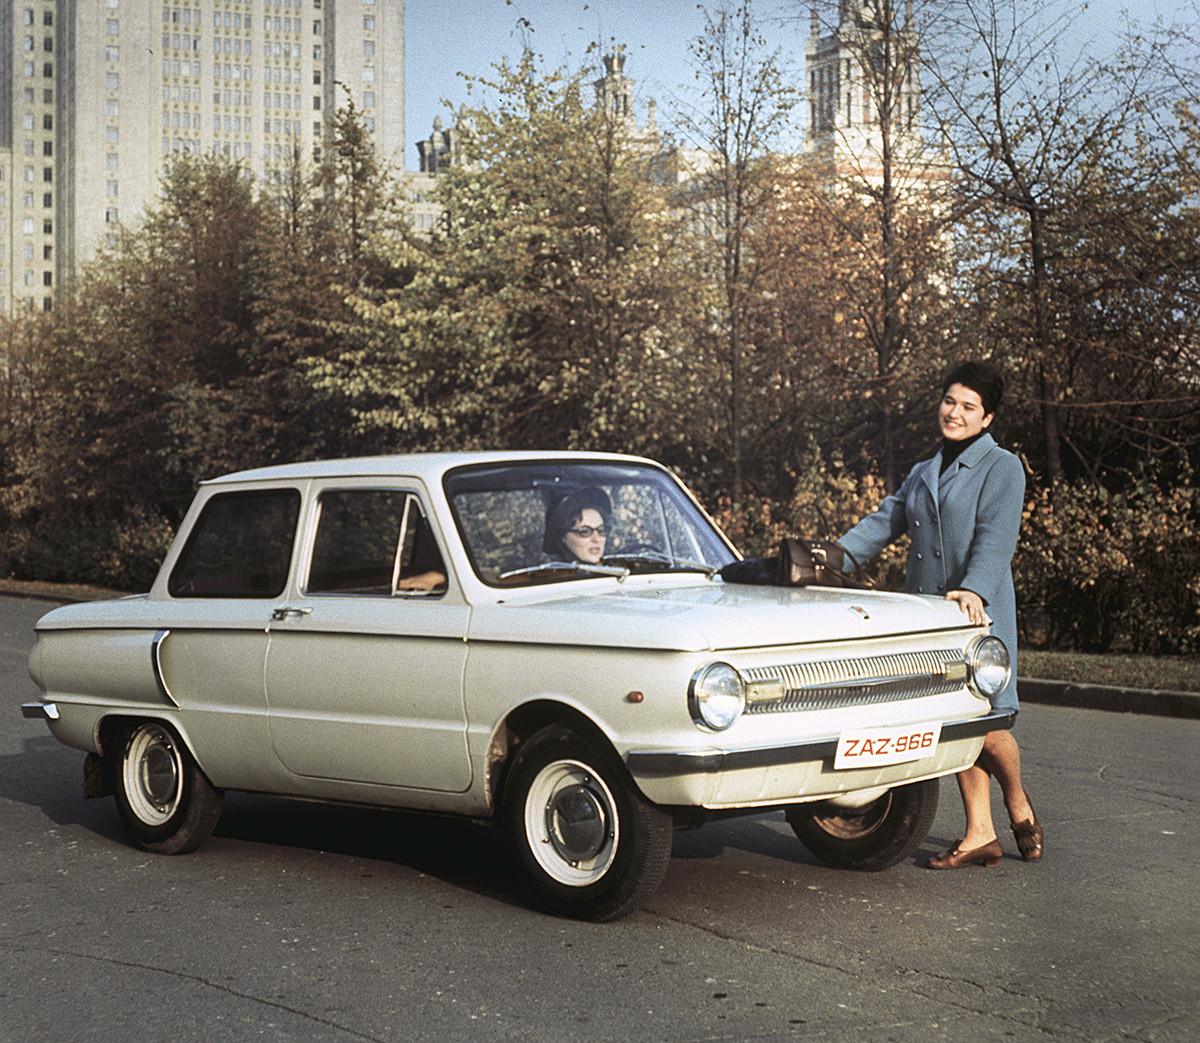 Лек автомобил ЗАЗ-966 на Запорожския автомобилен завод (сред народа просто